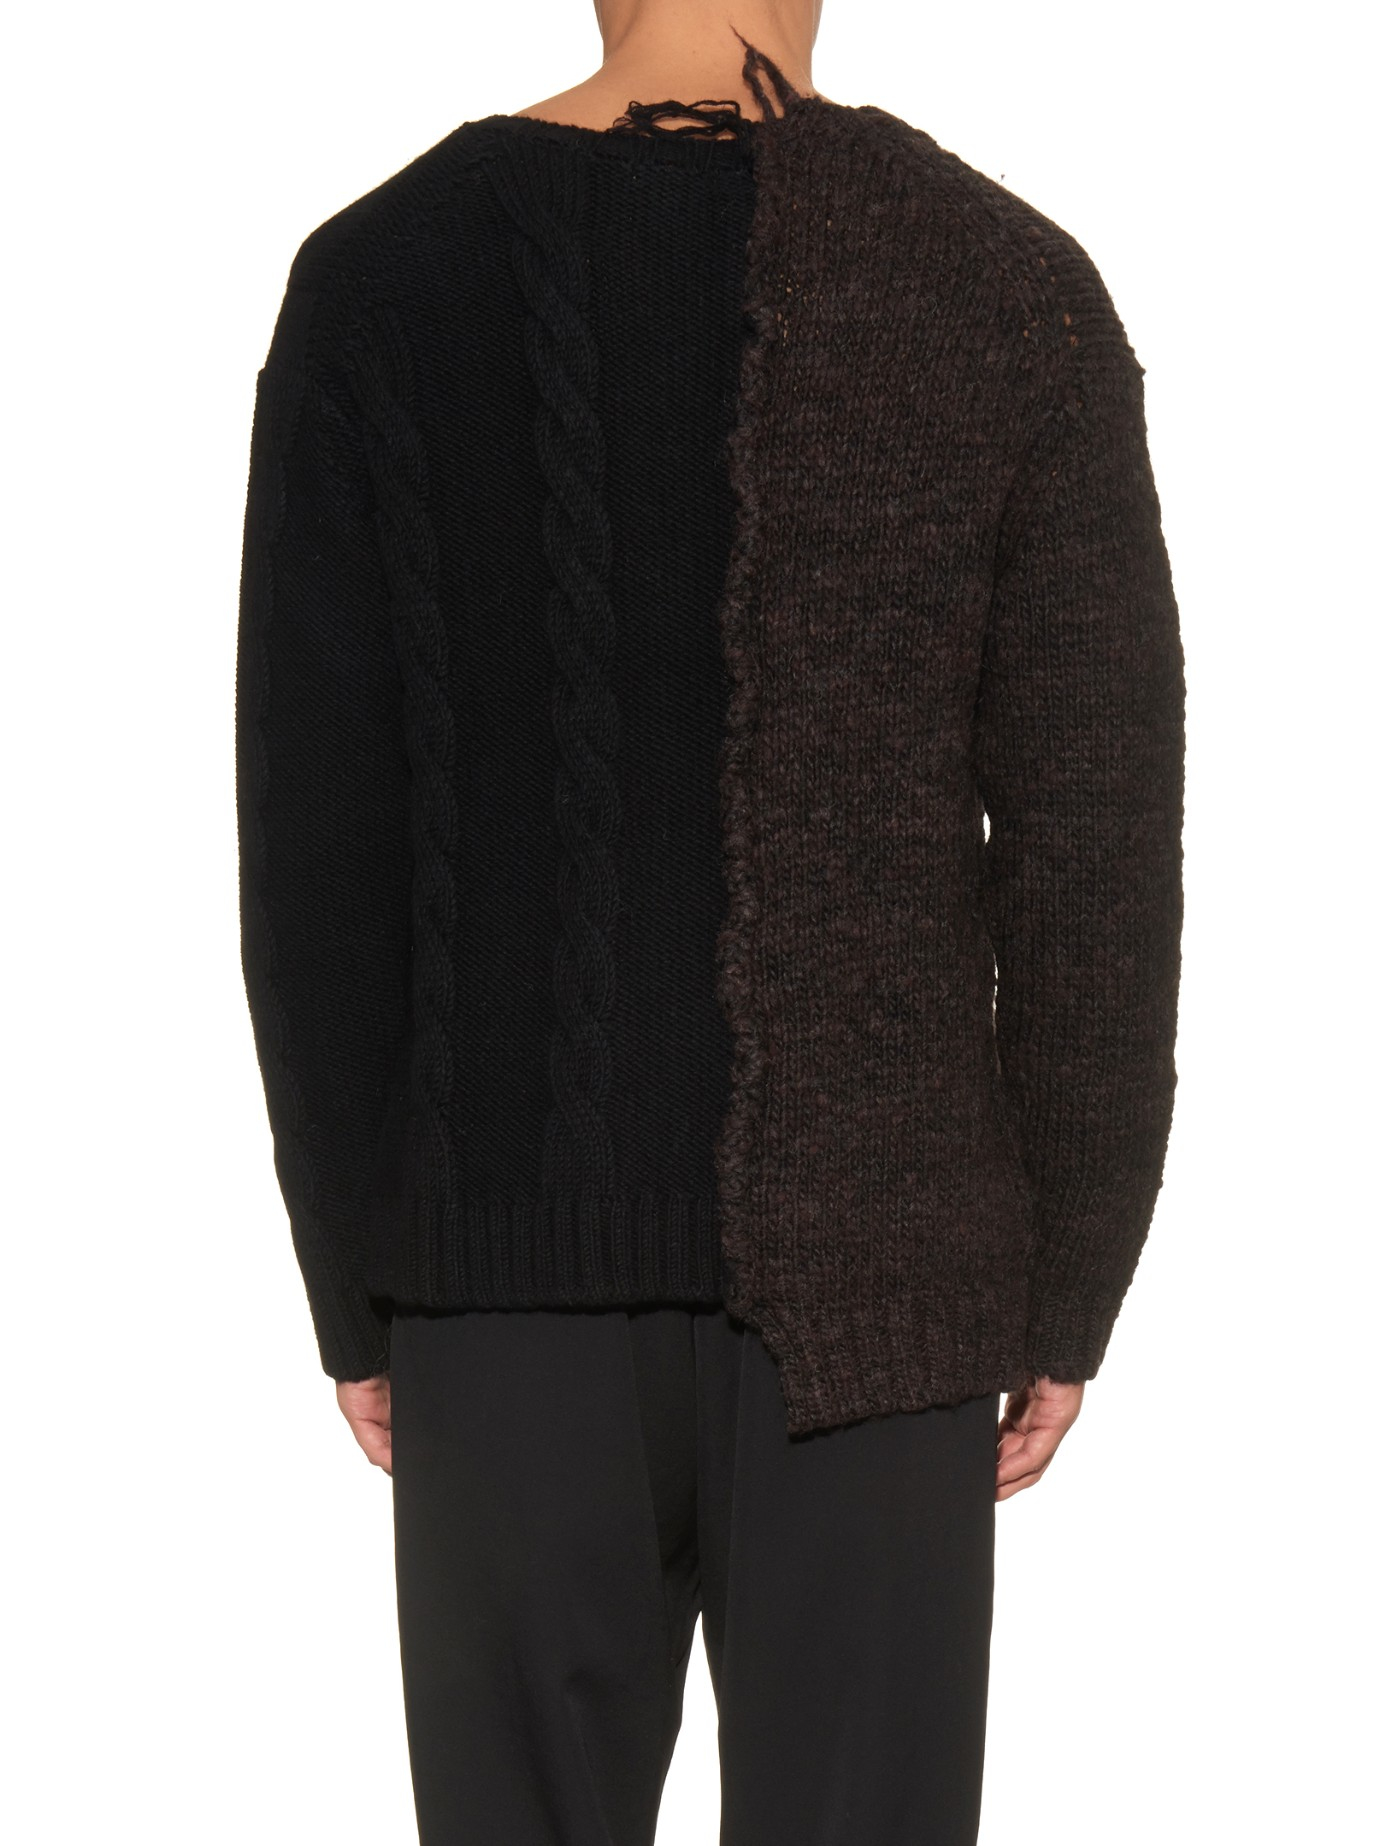 Yohji Yamamoto Mixed-knit Wool Sweater in Brown (Black) for Men